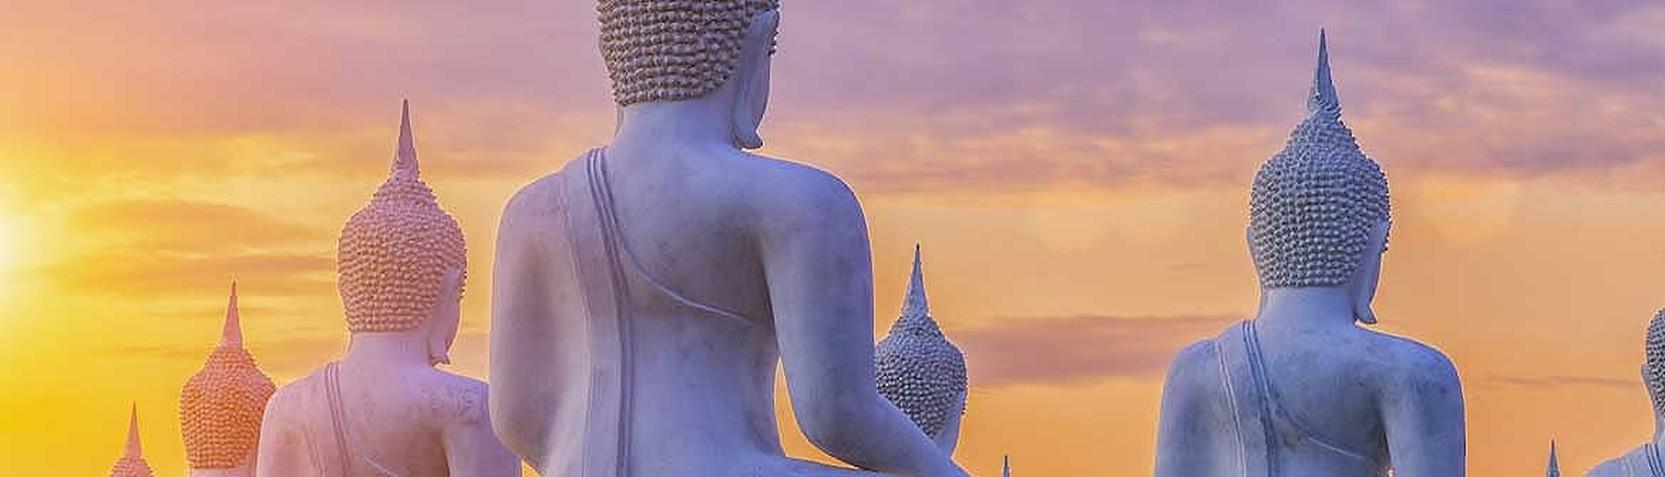 Photographie - Religion et spiritualité